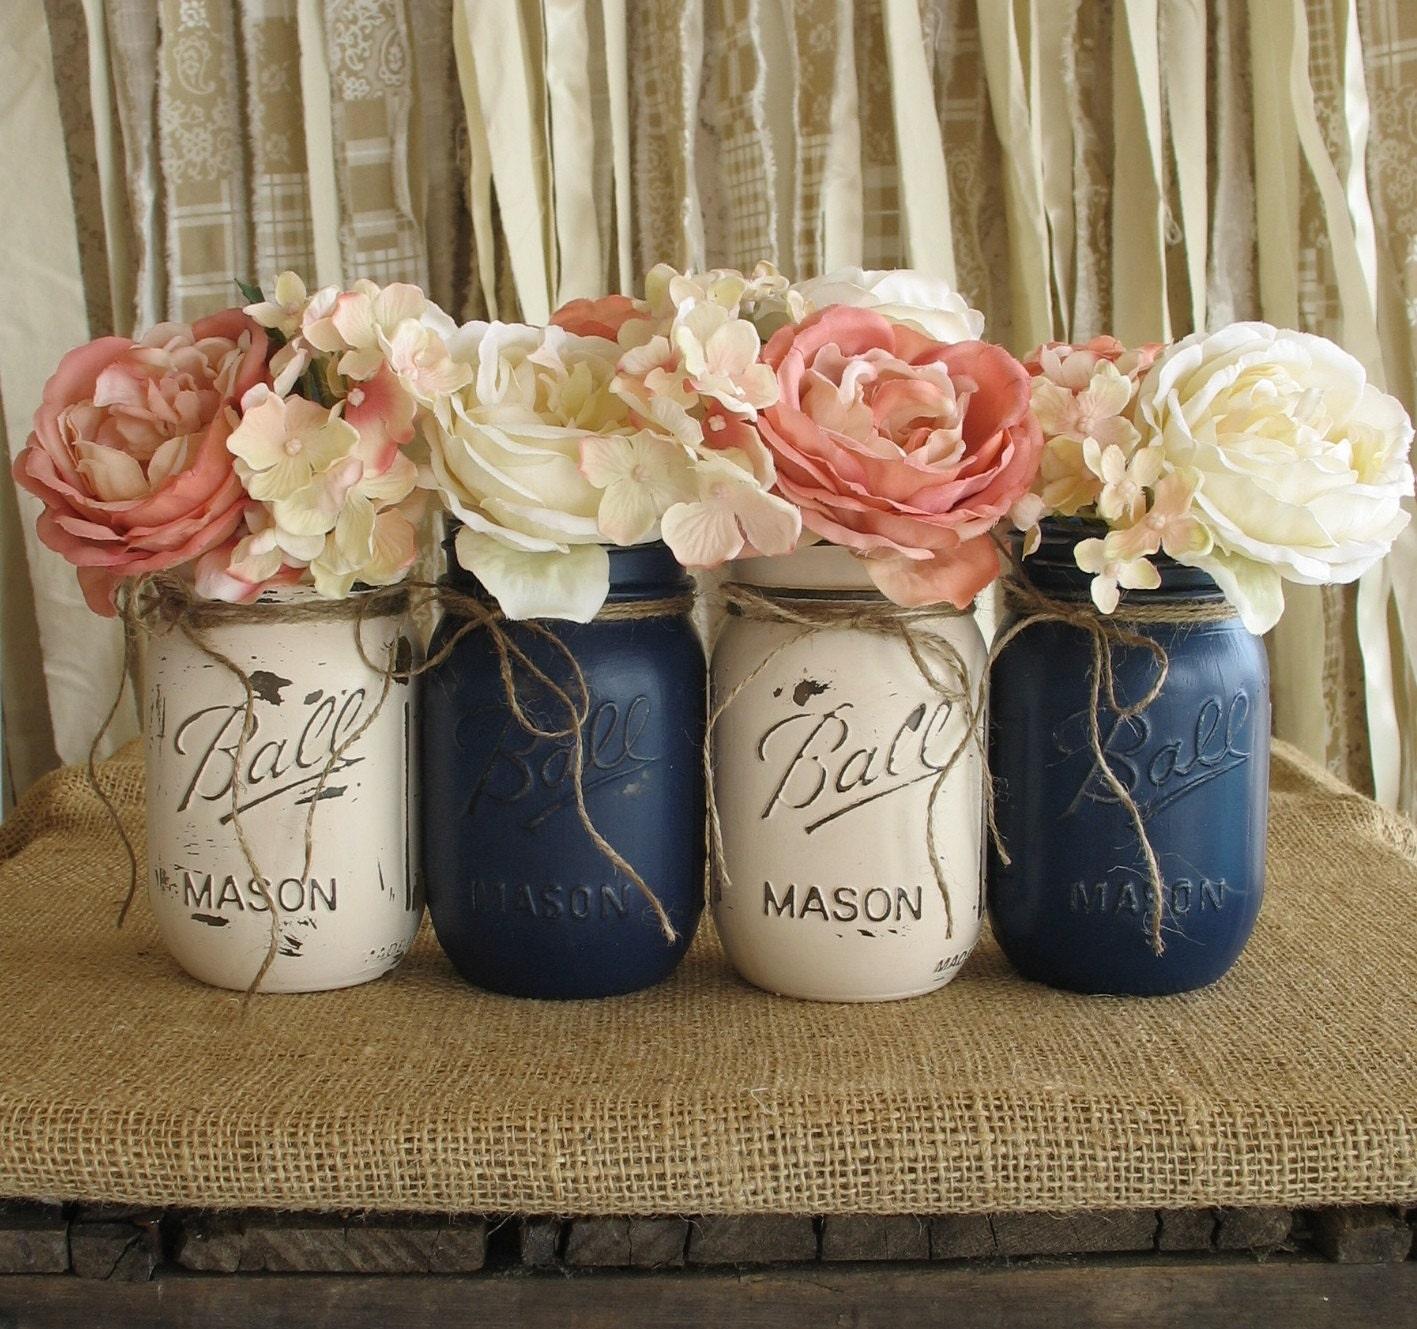 Wedding Flowers In Mason Jars: SALE Set Of 4 Pint Mason Jars Ball Jars Painted Mason